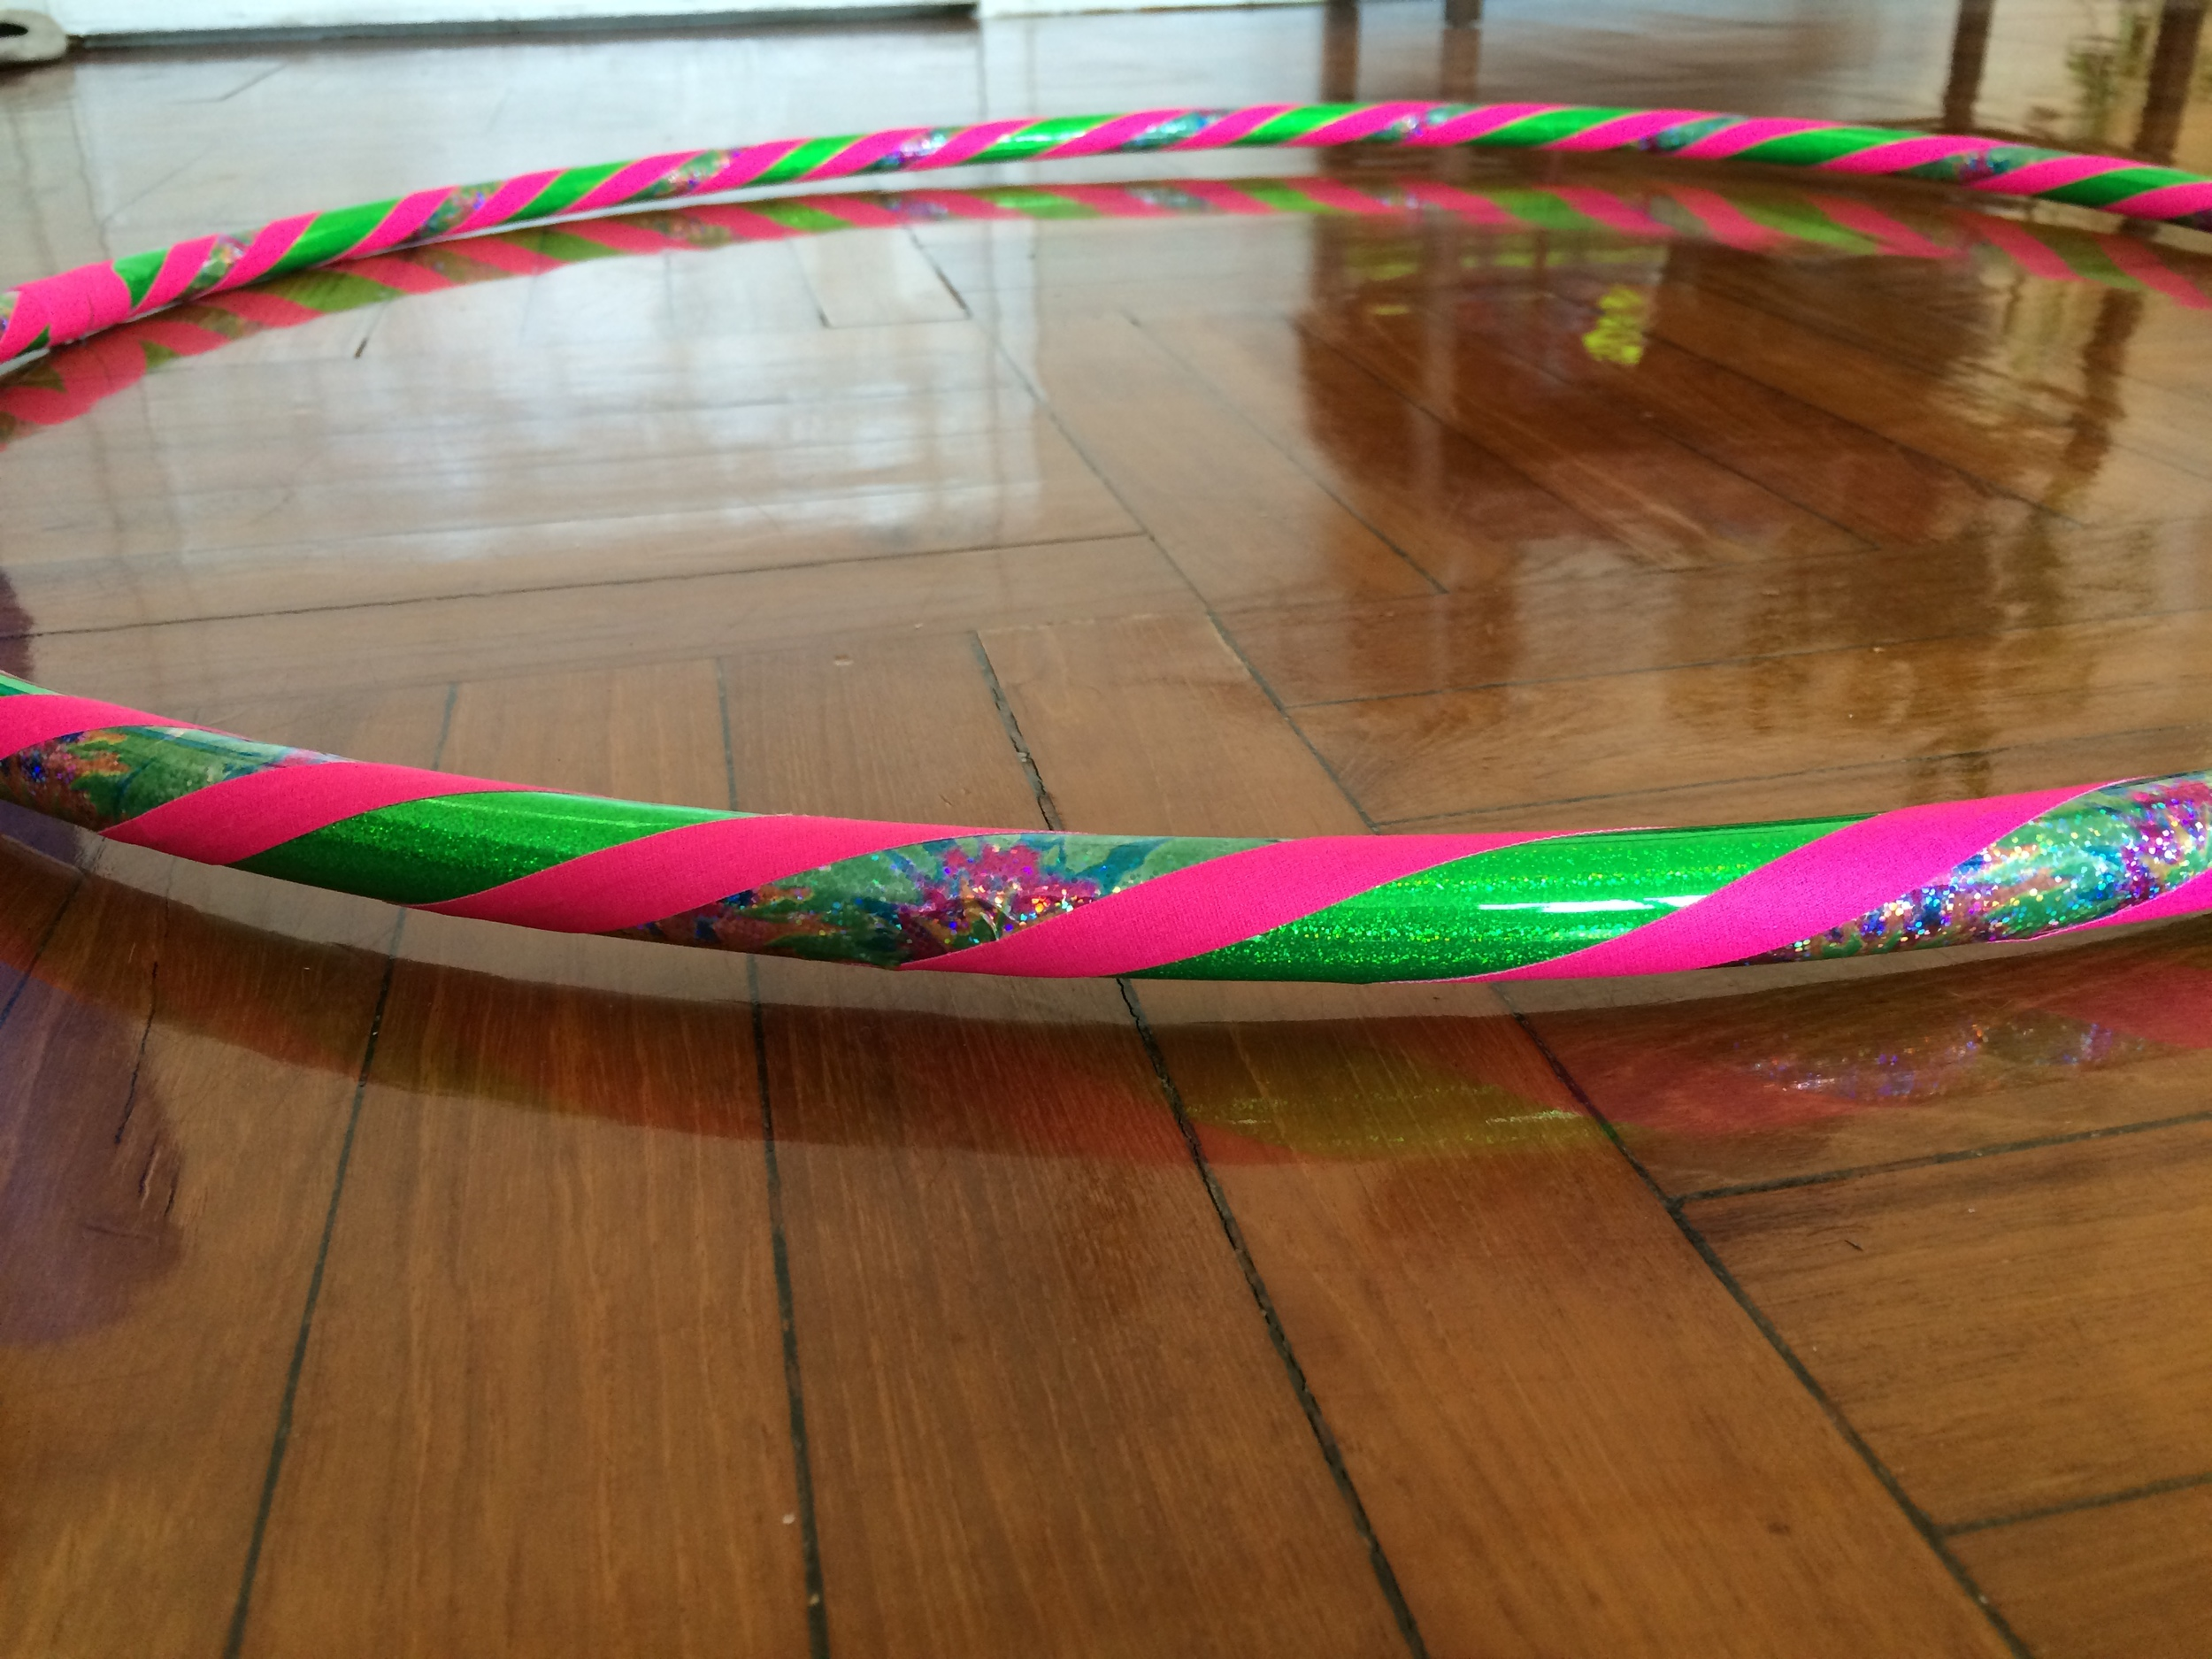 buy a hula hoop hong kong 香港呼啦圈選購店